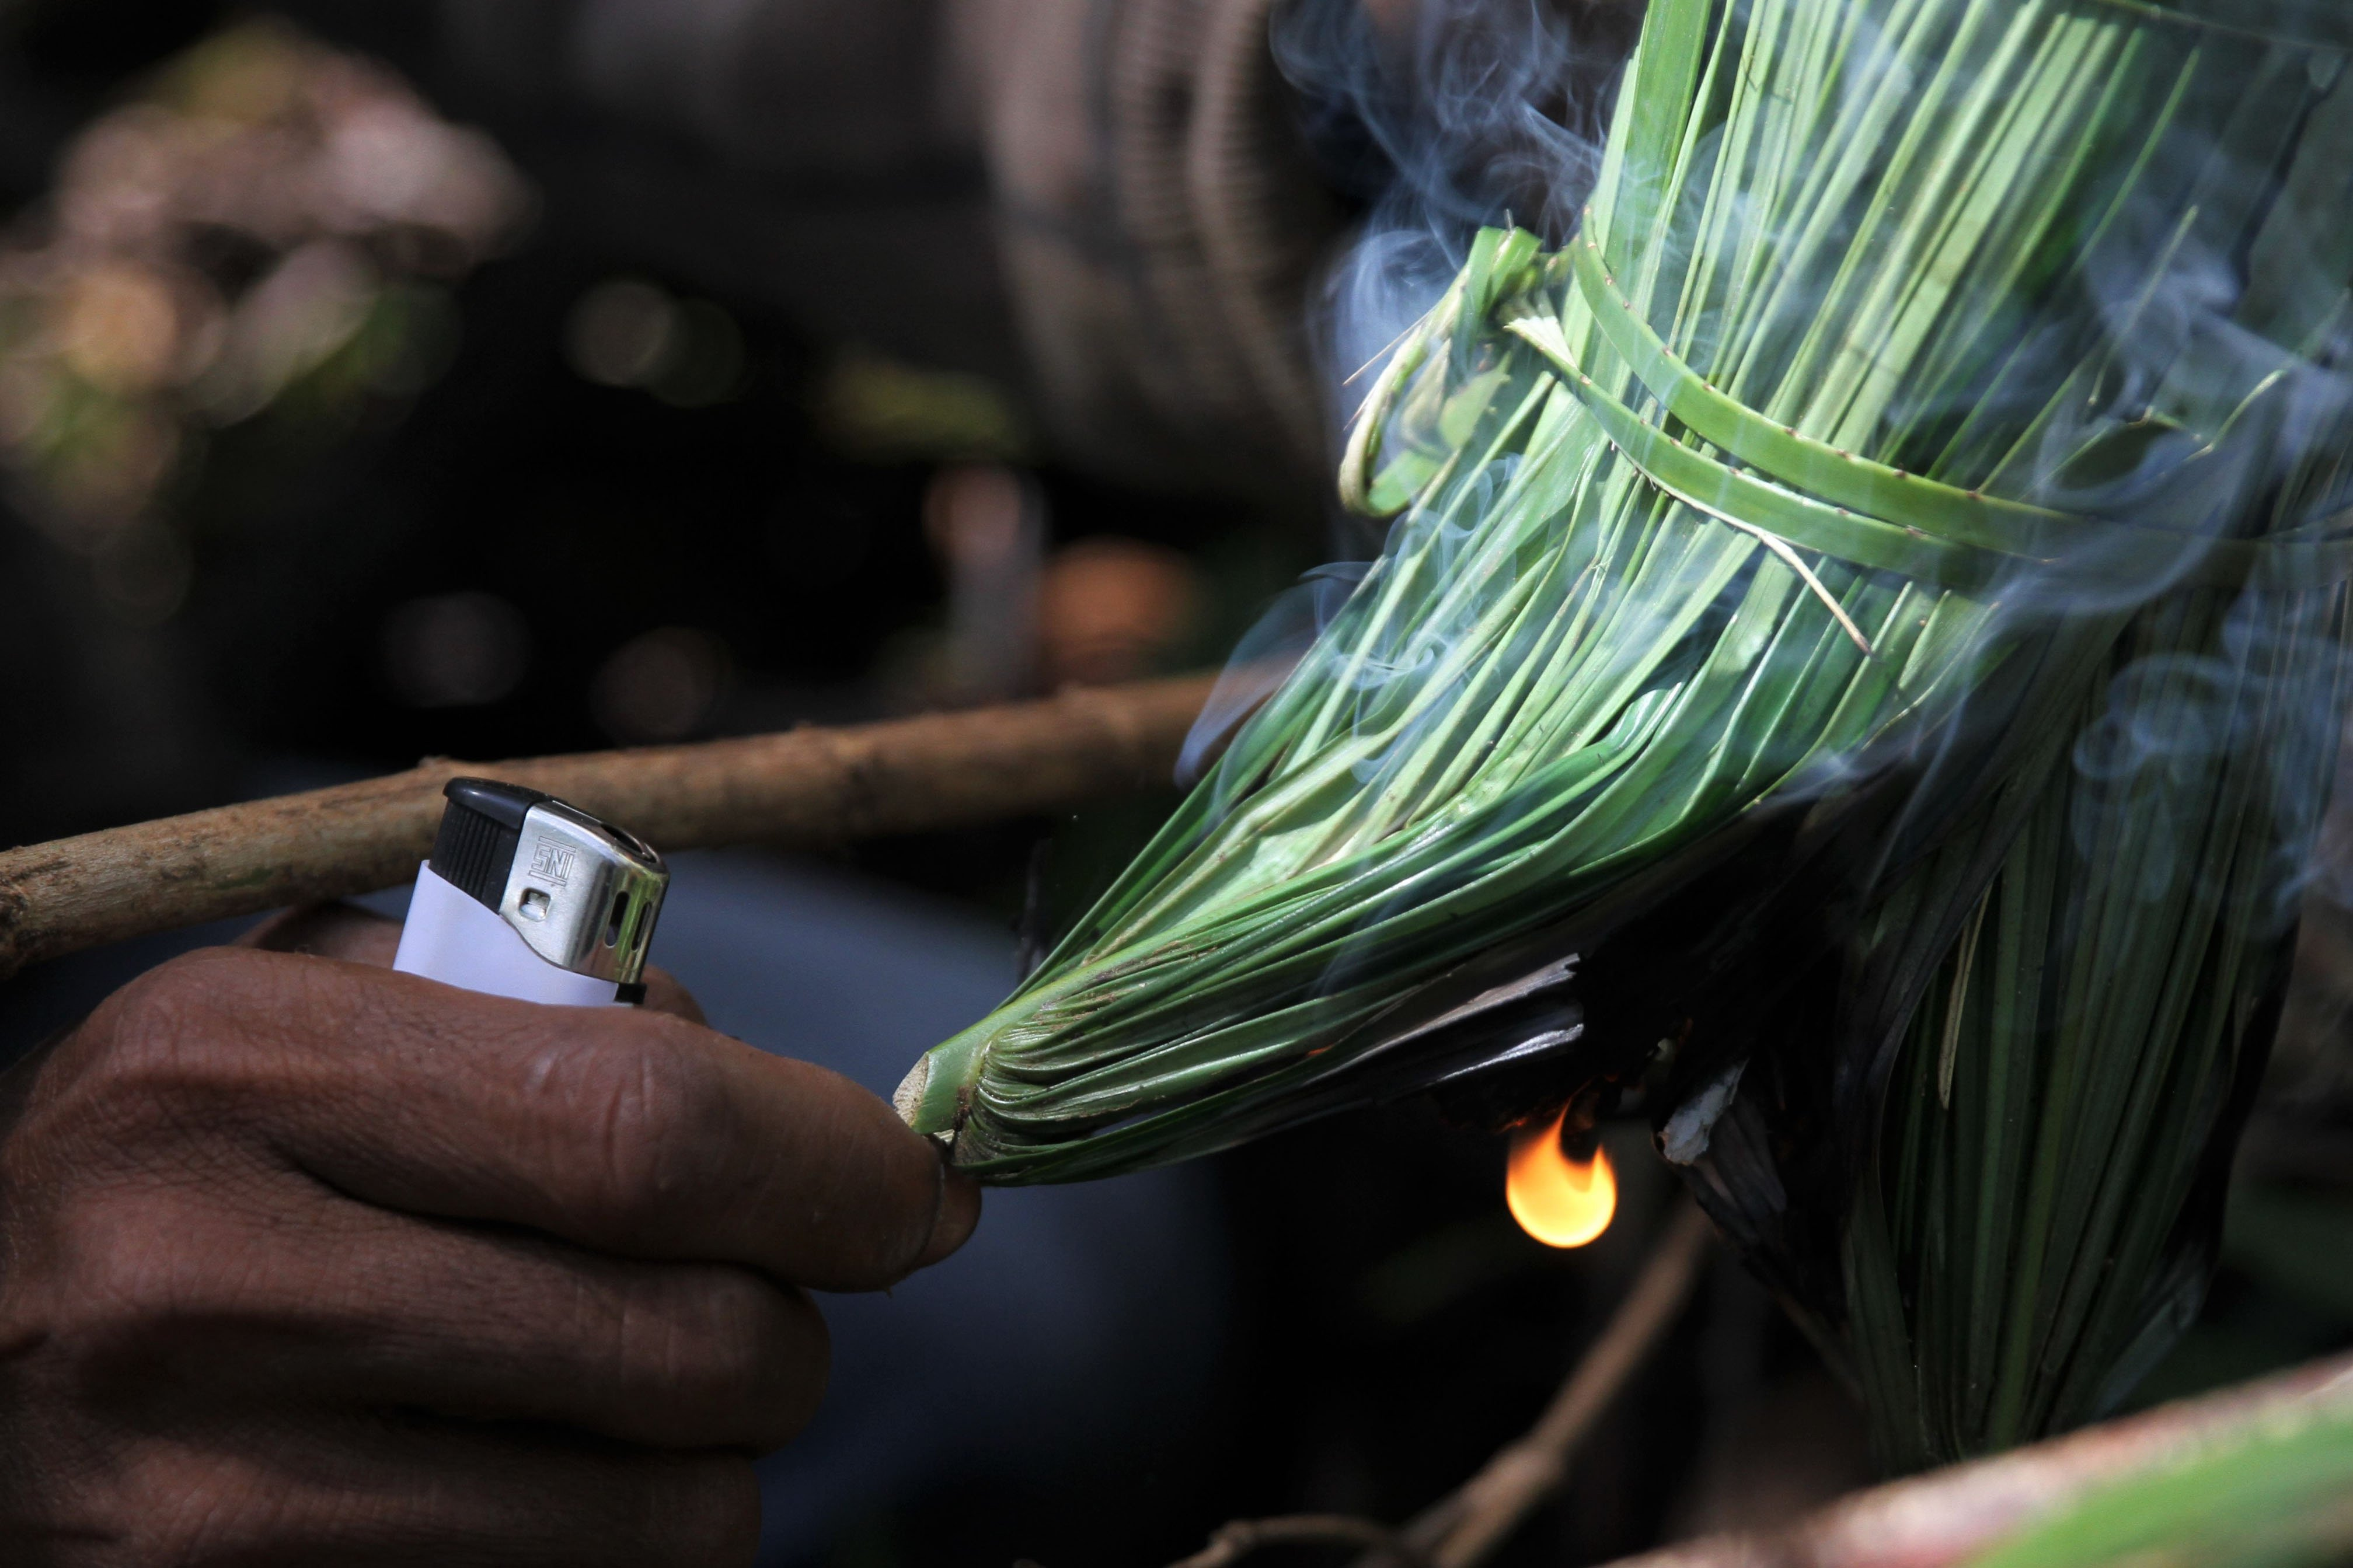 Triono membakar dedaunan kering dan basah agar lebah lari saat mengenai asap di kawasan Gunung Landono di Desa Landono 2, Kecamatan Landono, Konawe Selatan, Sulawesi Tenggara.